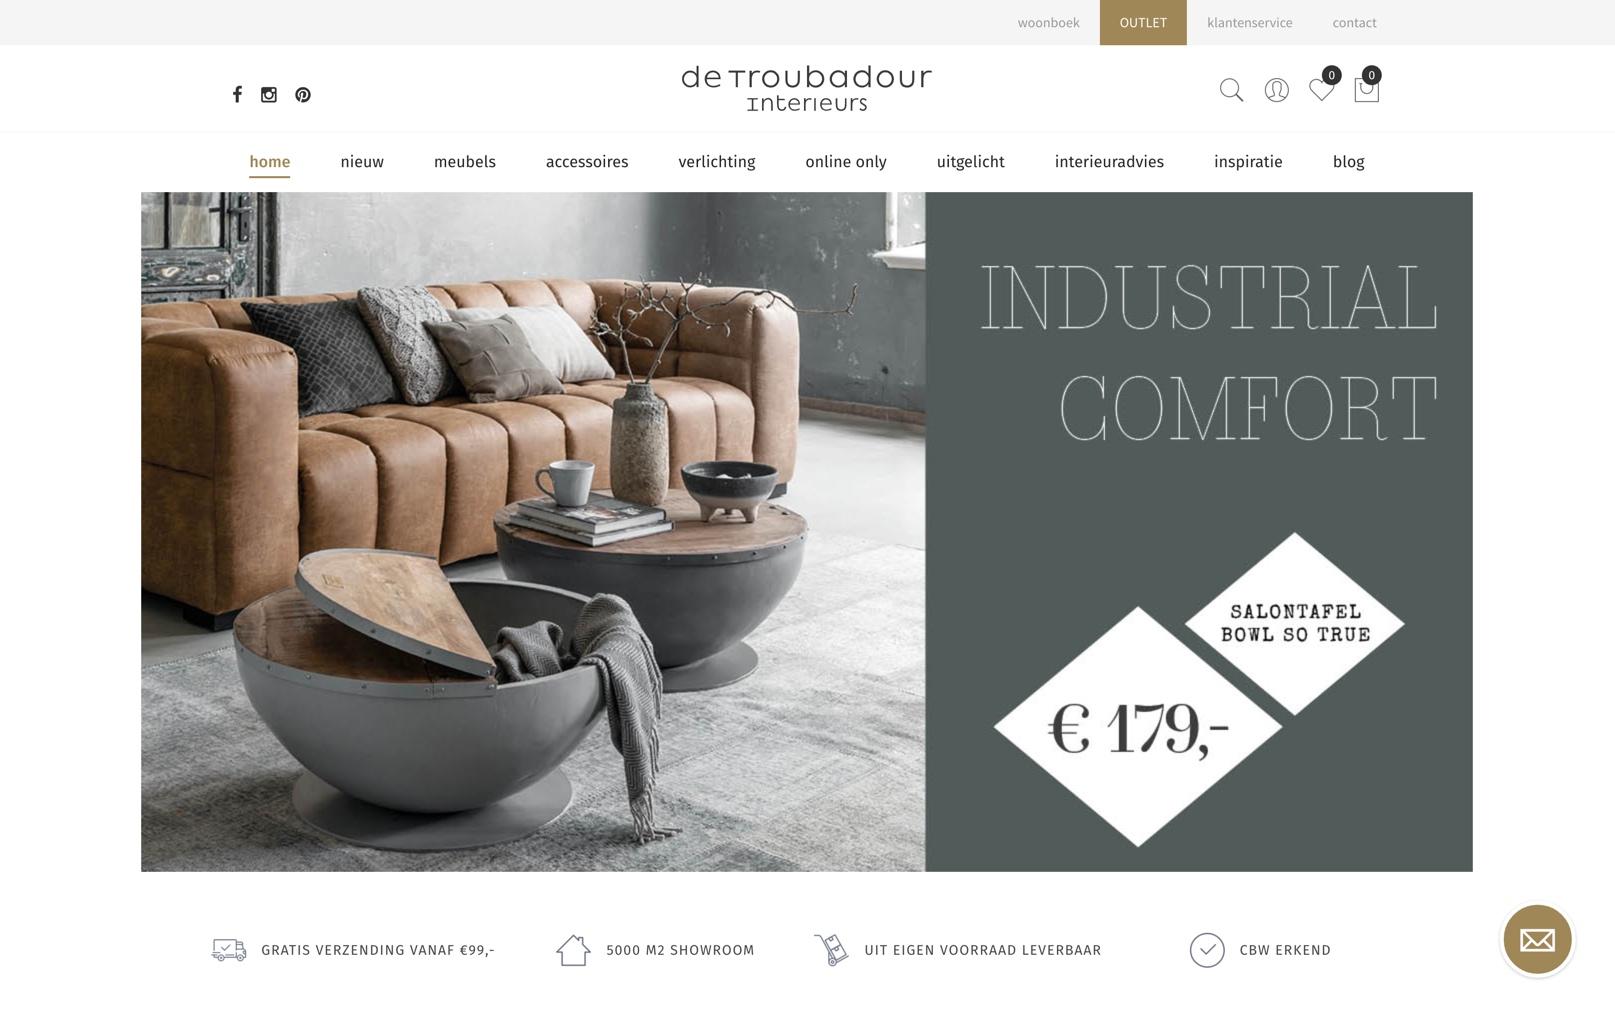 detroubadour-website1